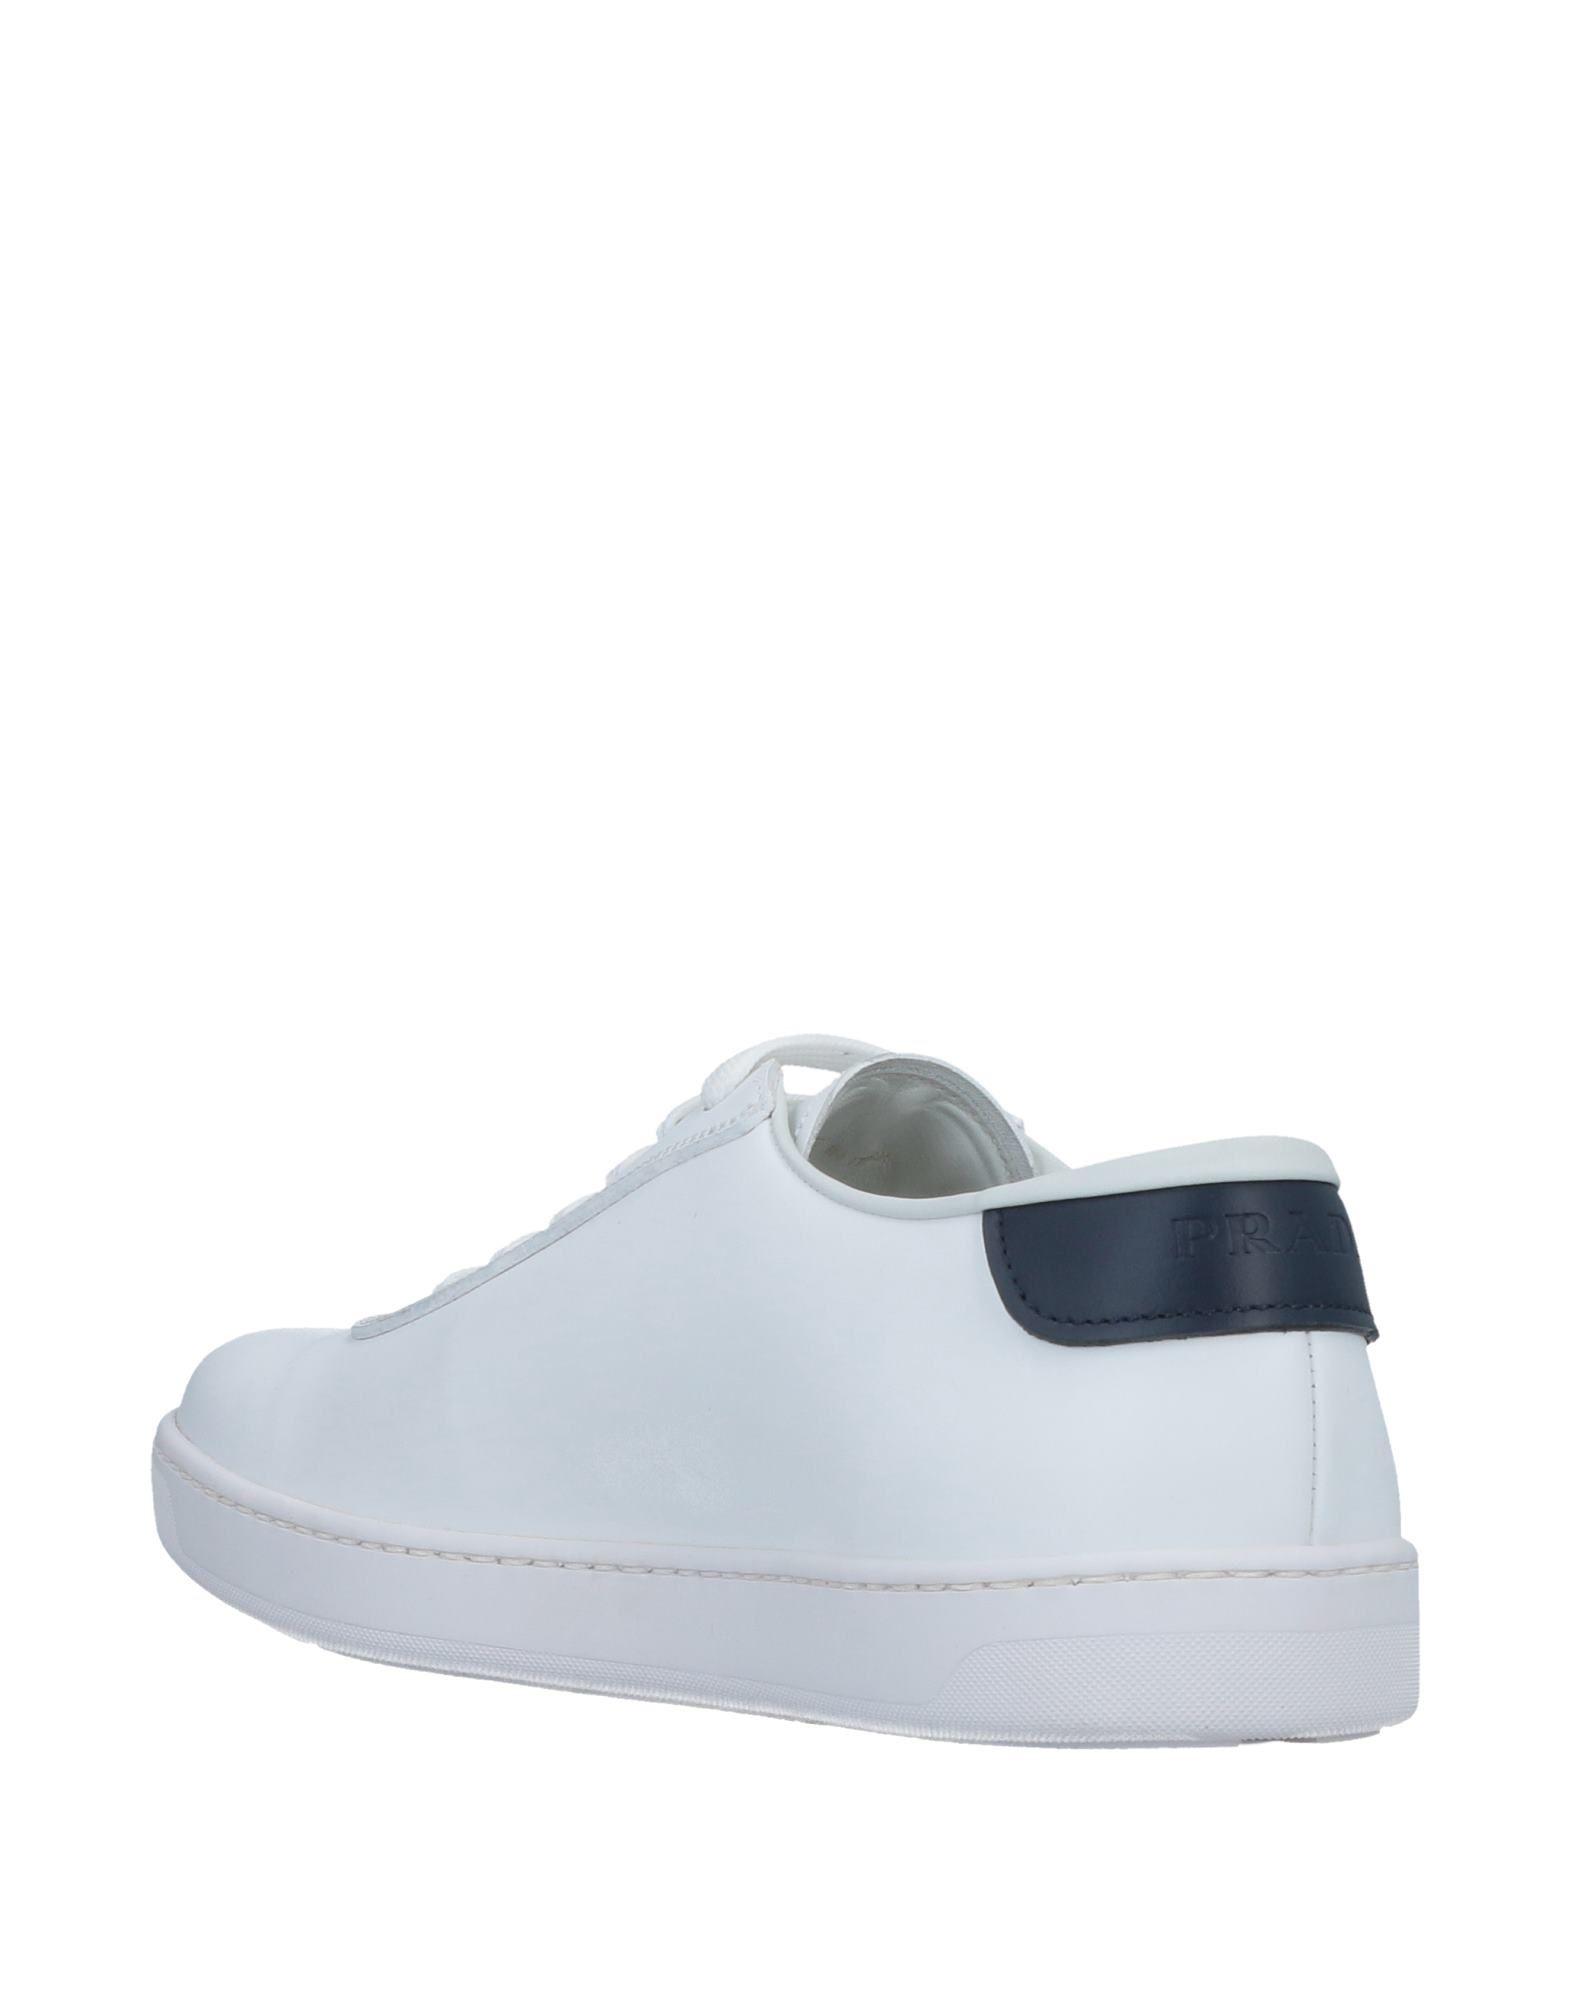 Prada Herren Sport Sneakers Herren Prada  11505295XK 0837db